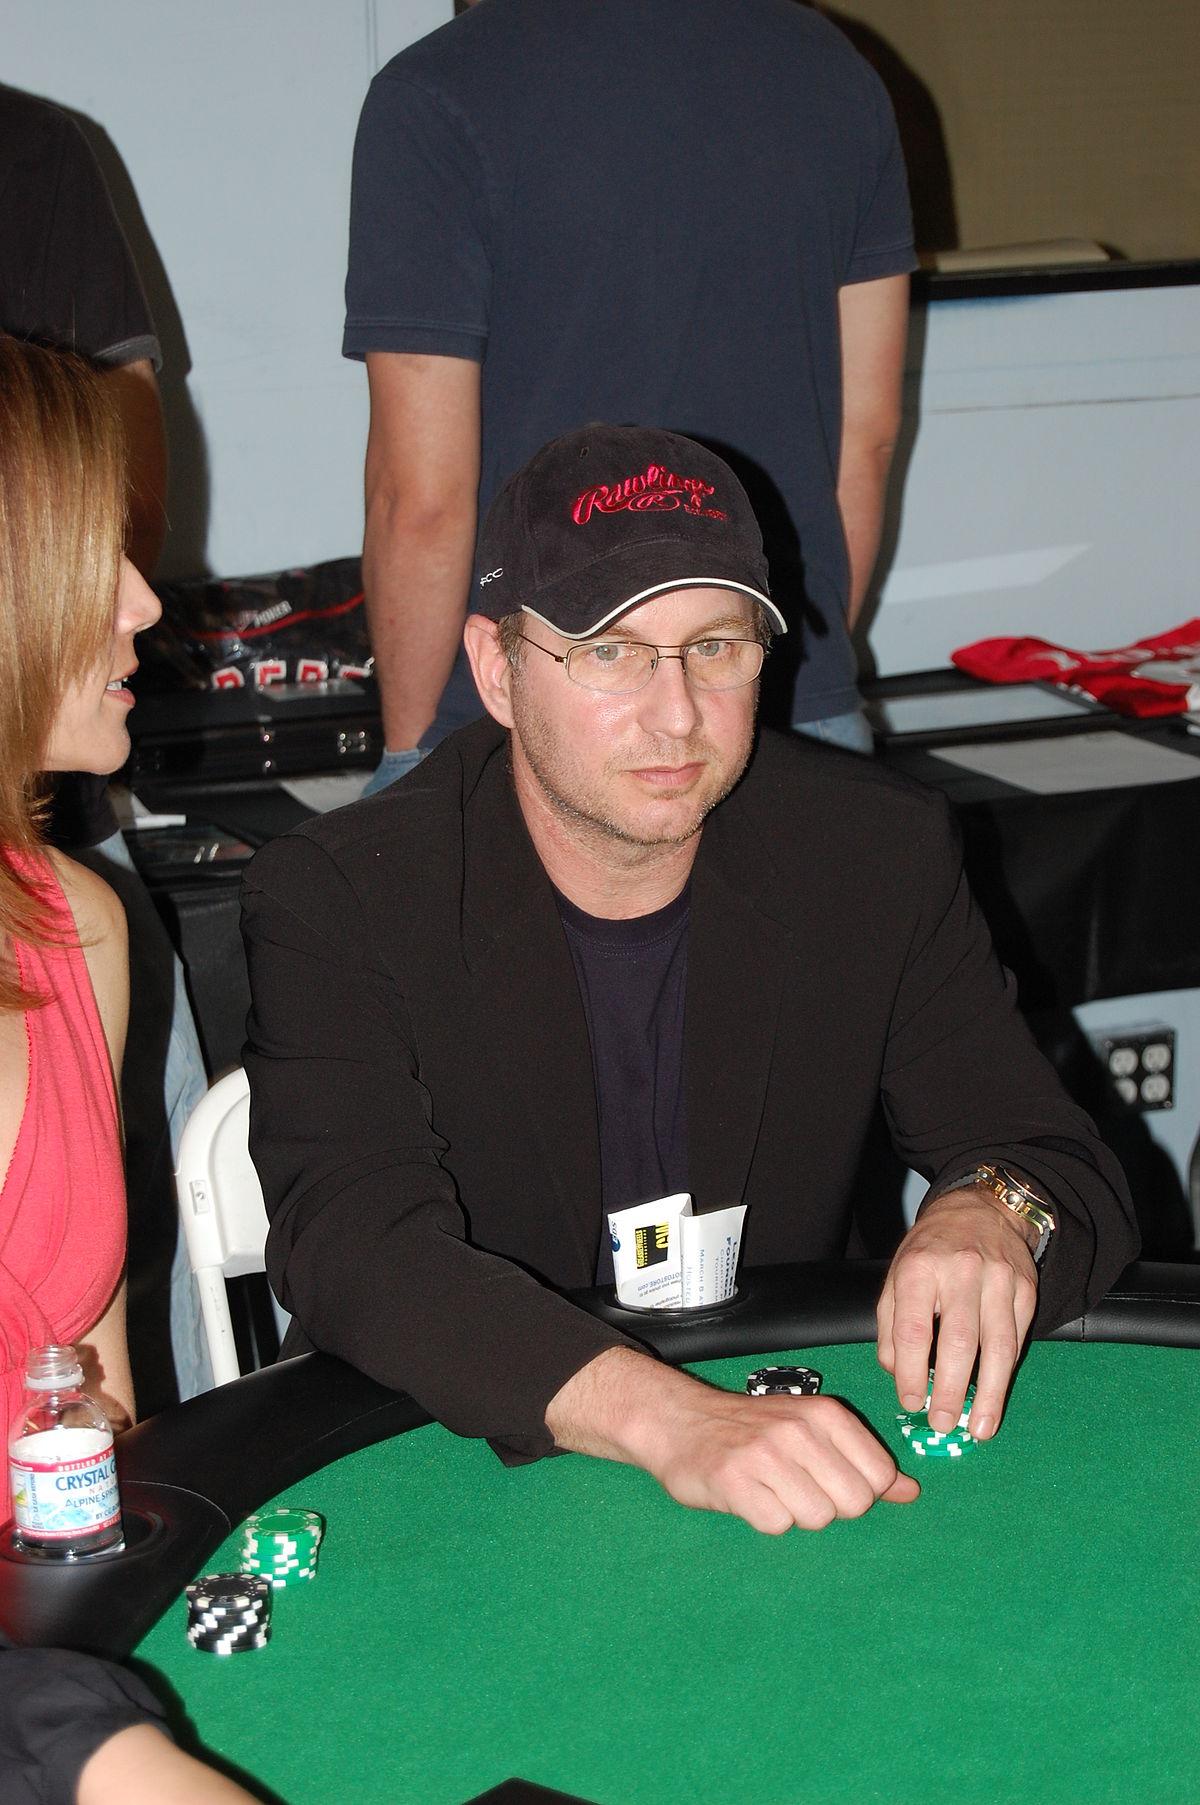 roy winston  poker player